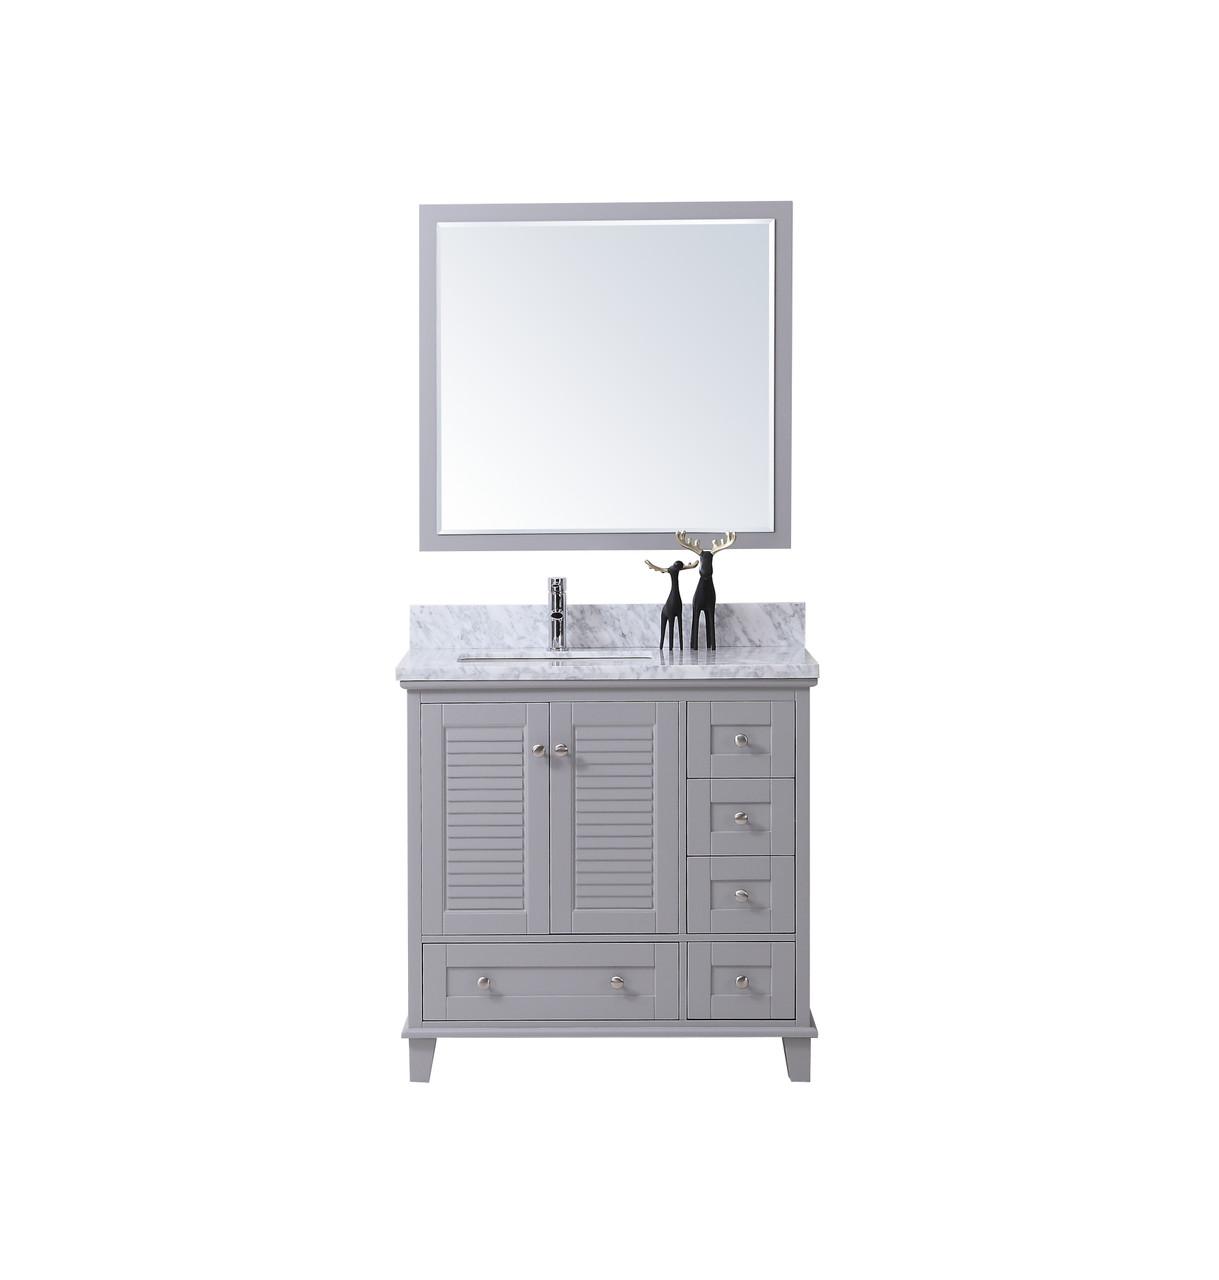 Niagara 42 Bathroom Vanity Light Grey York Taps